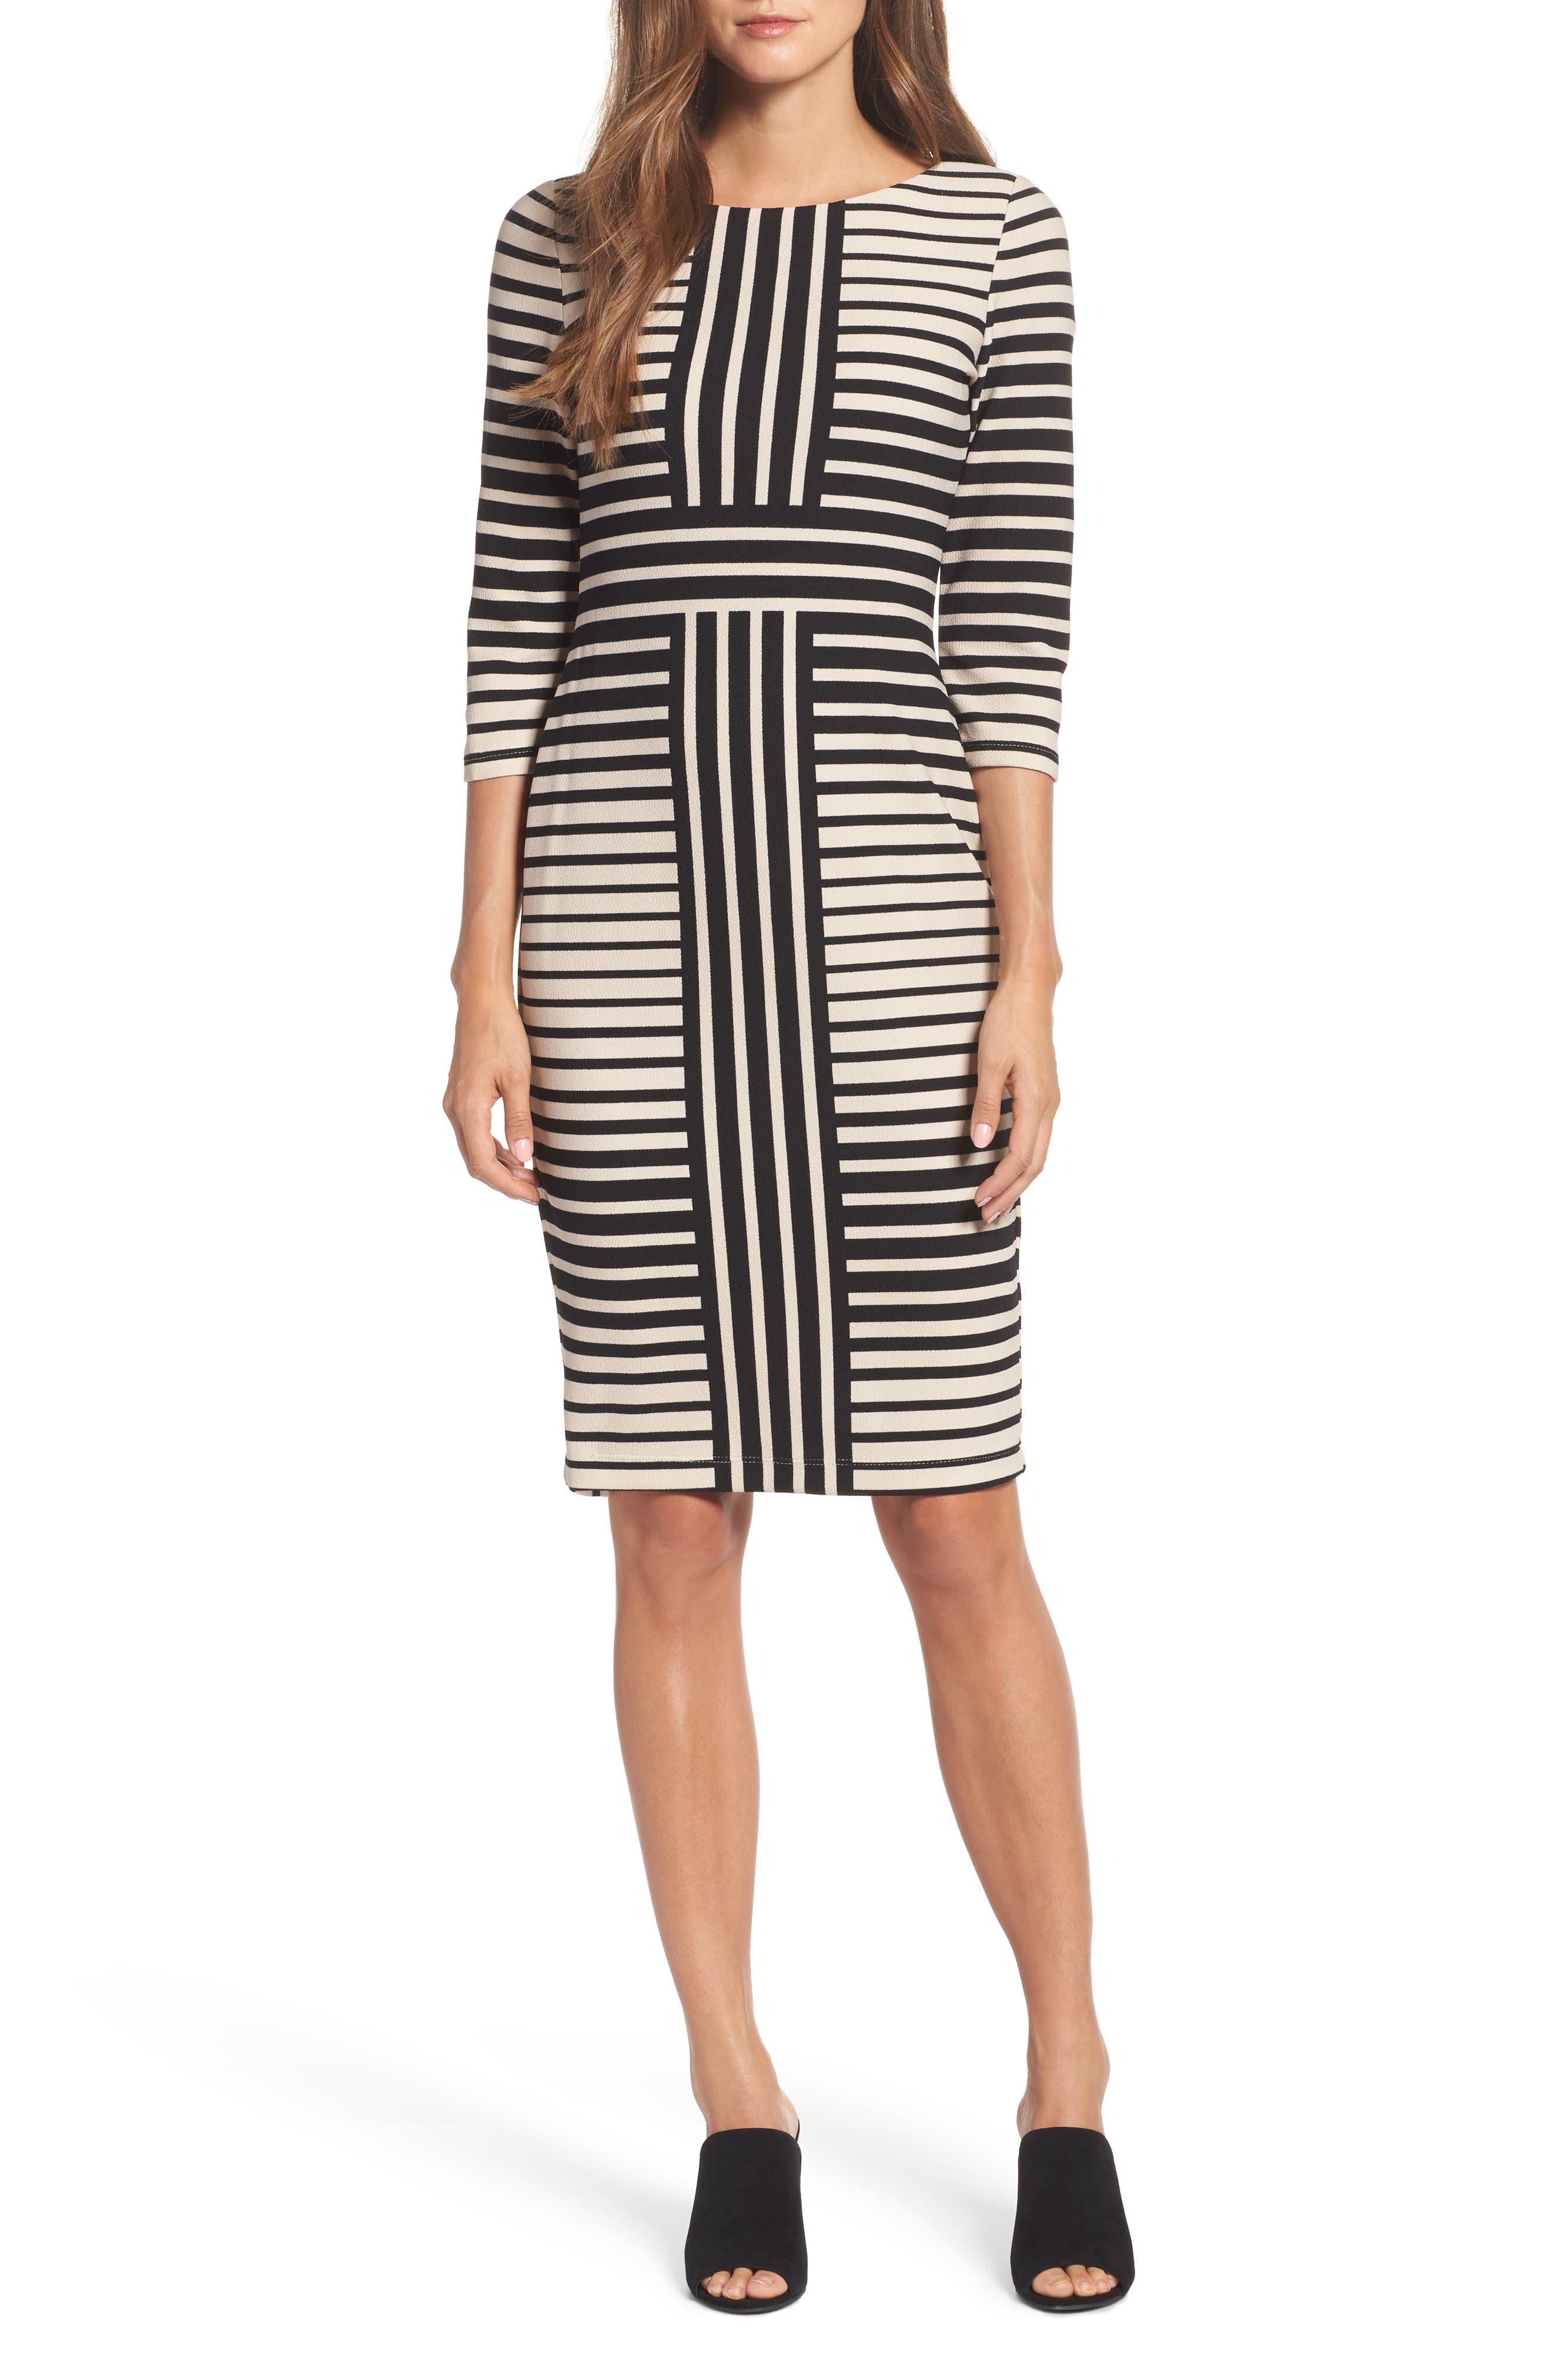 Main Image - Gabby Skye Stripe Sheath Dress